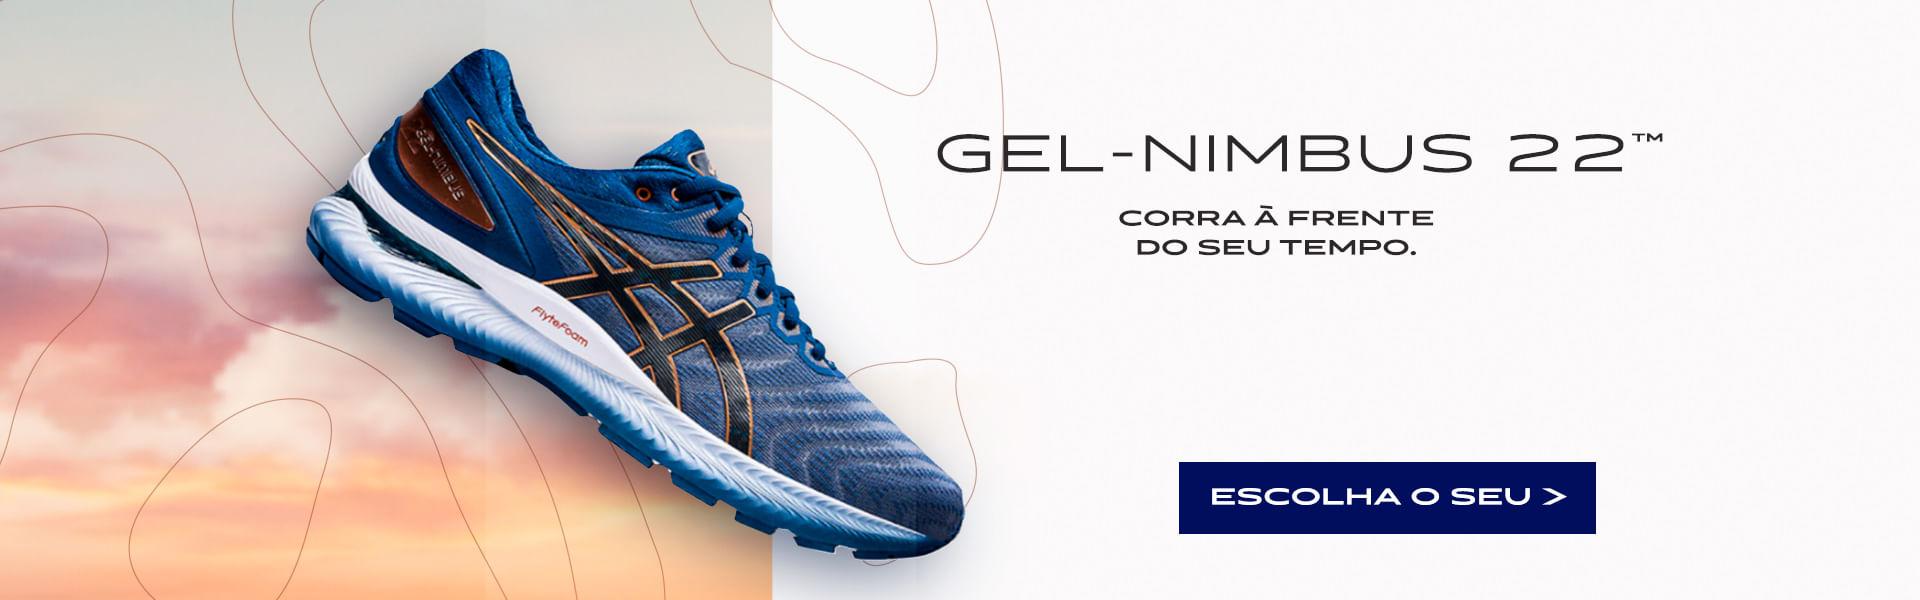 Campanha GEL-Nimbus 22